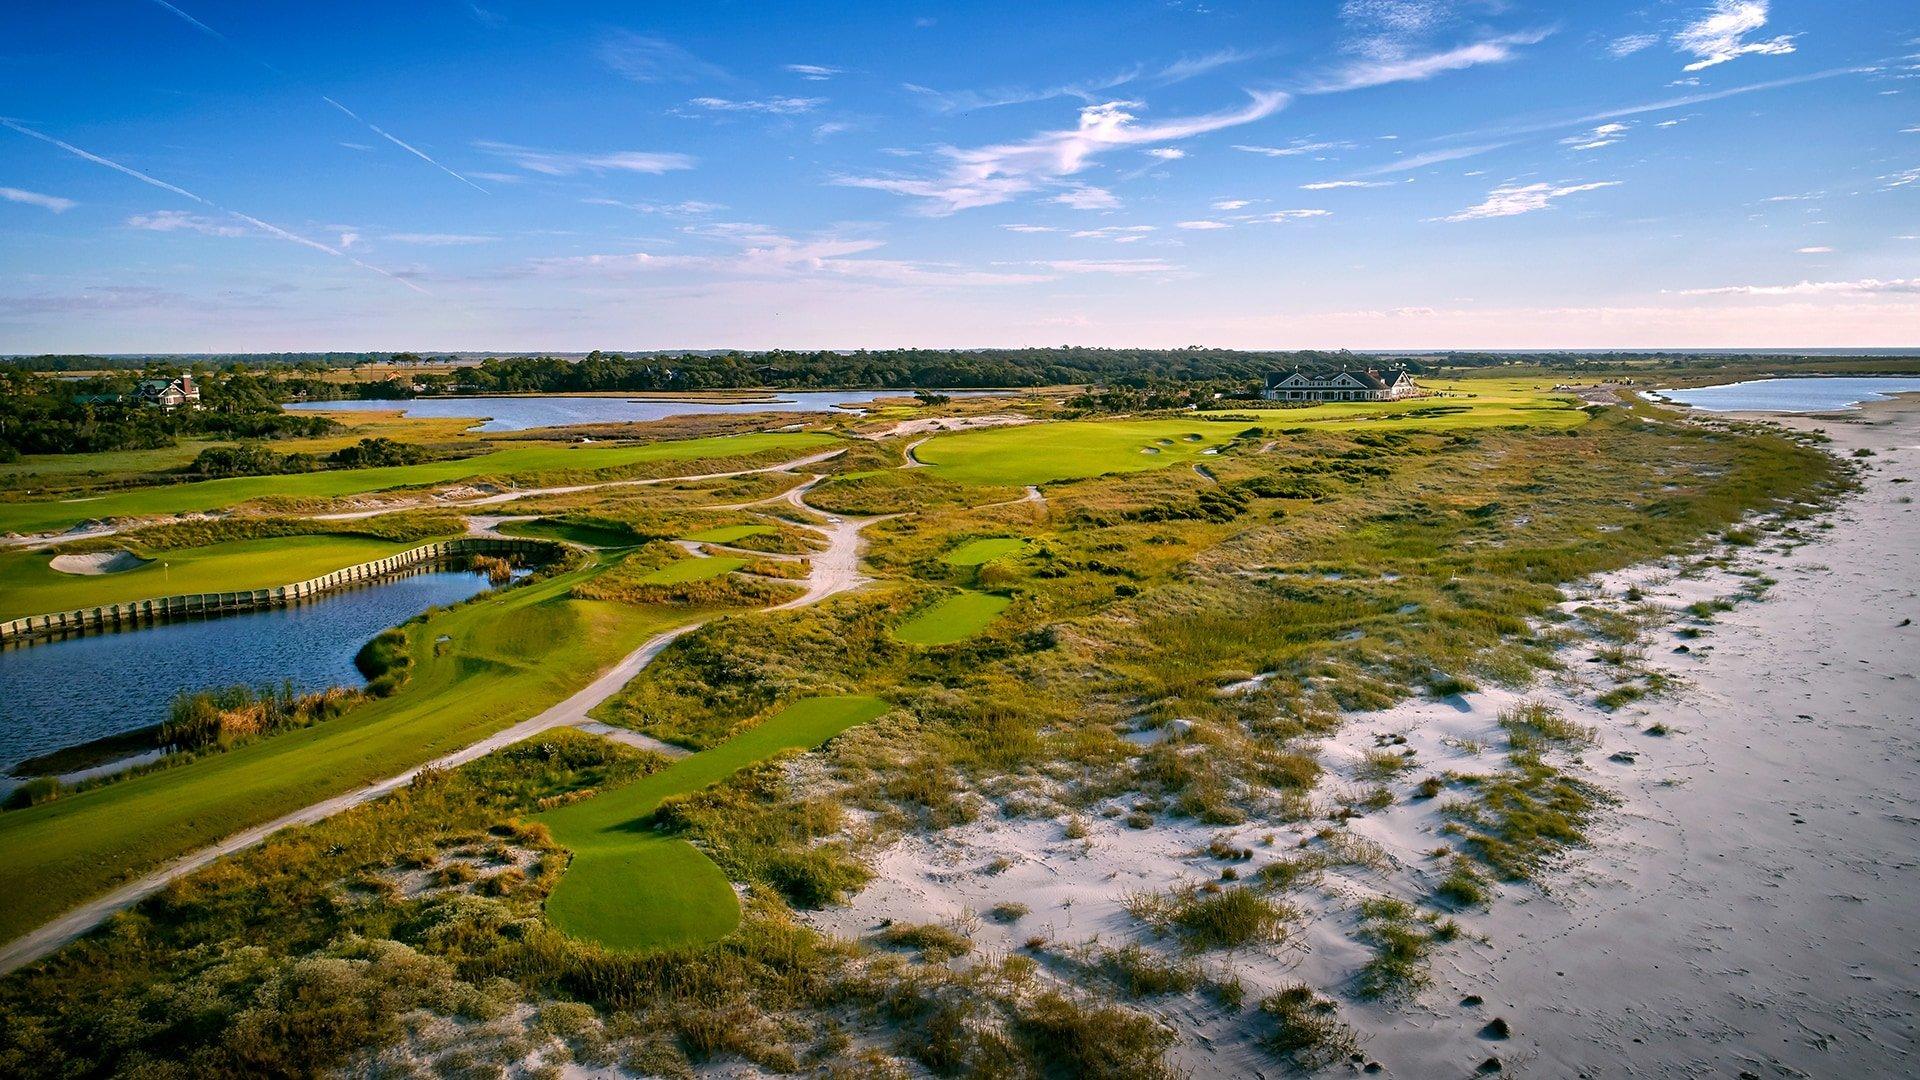 Rory McIlroy, Jordan Spieth Chase History at PGA Championship